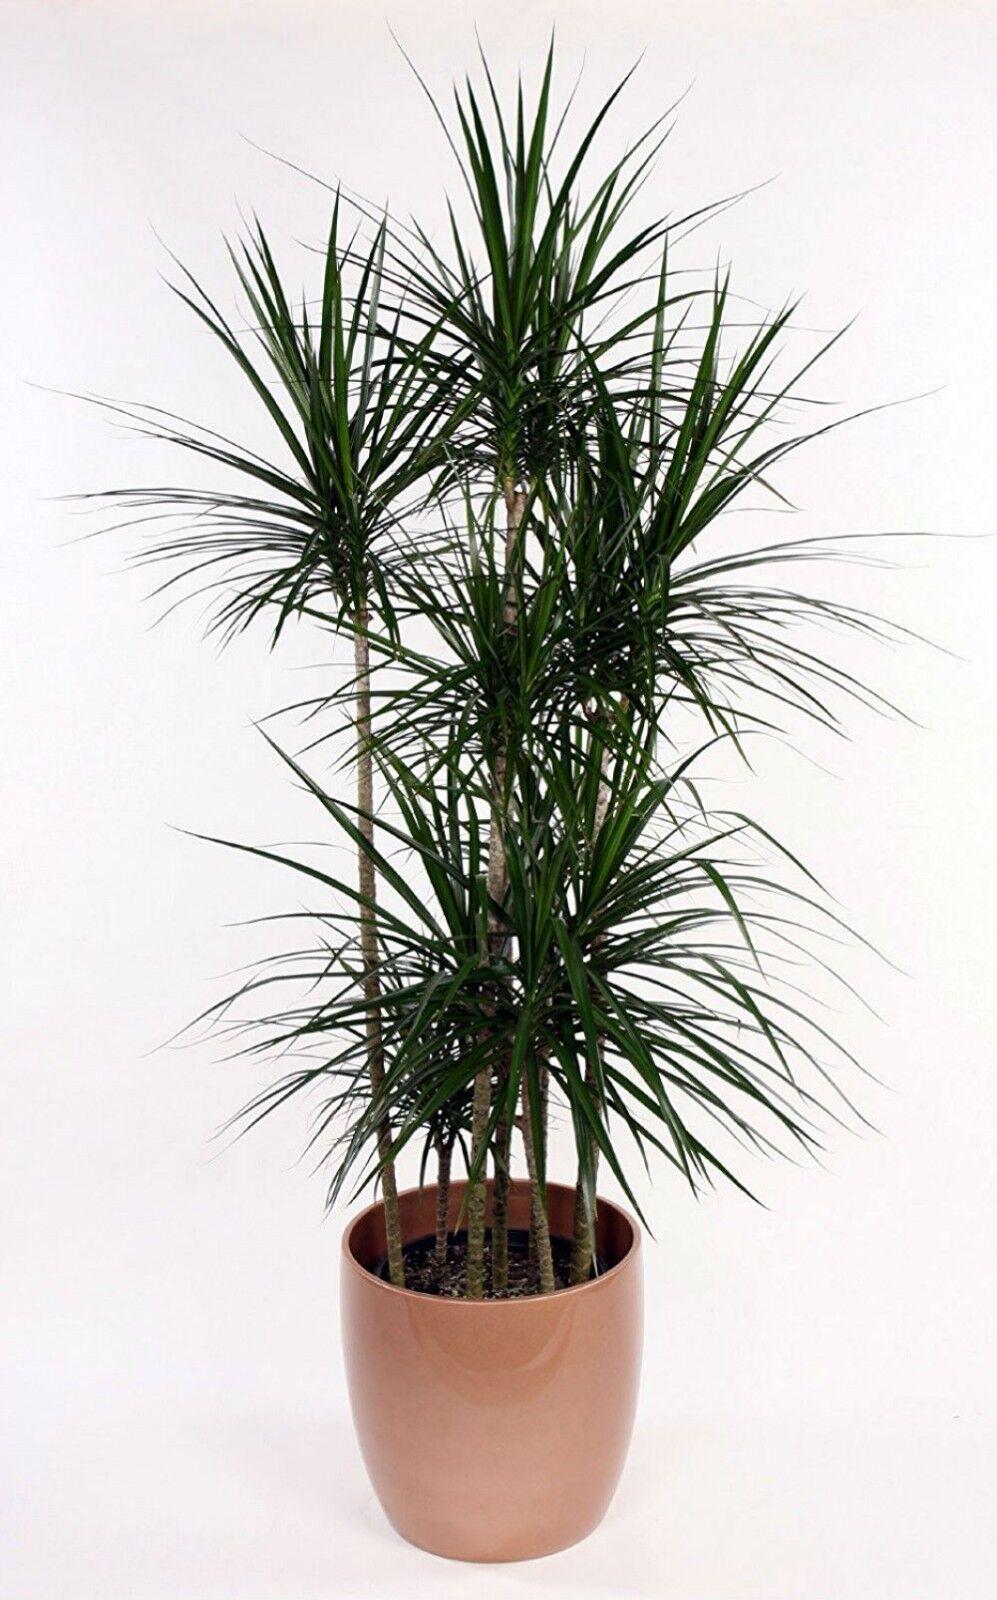 Madagascar Dragon Tree Live Plant Dracaena Marginata 4 Pot Easy Grow Houseplant For Sale Online